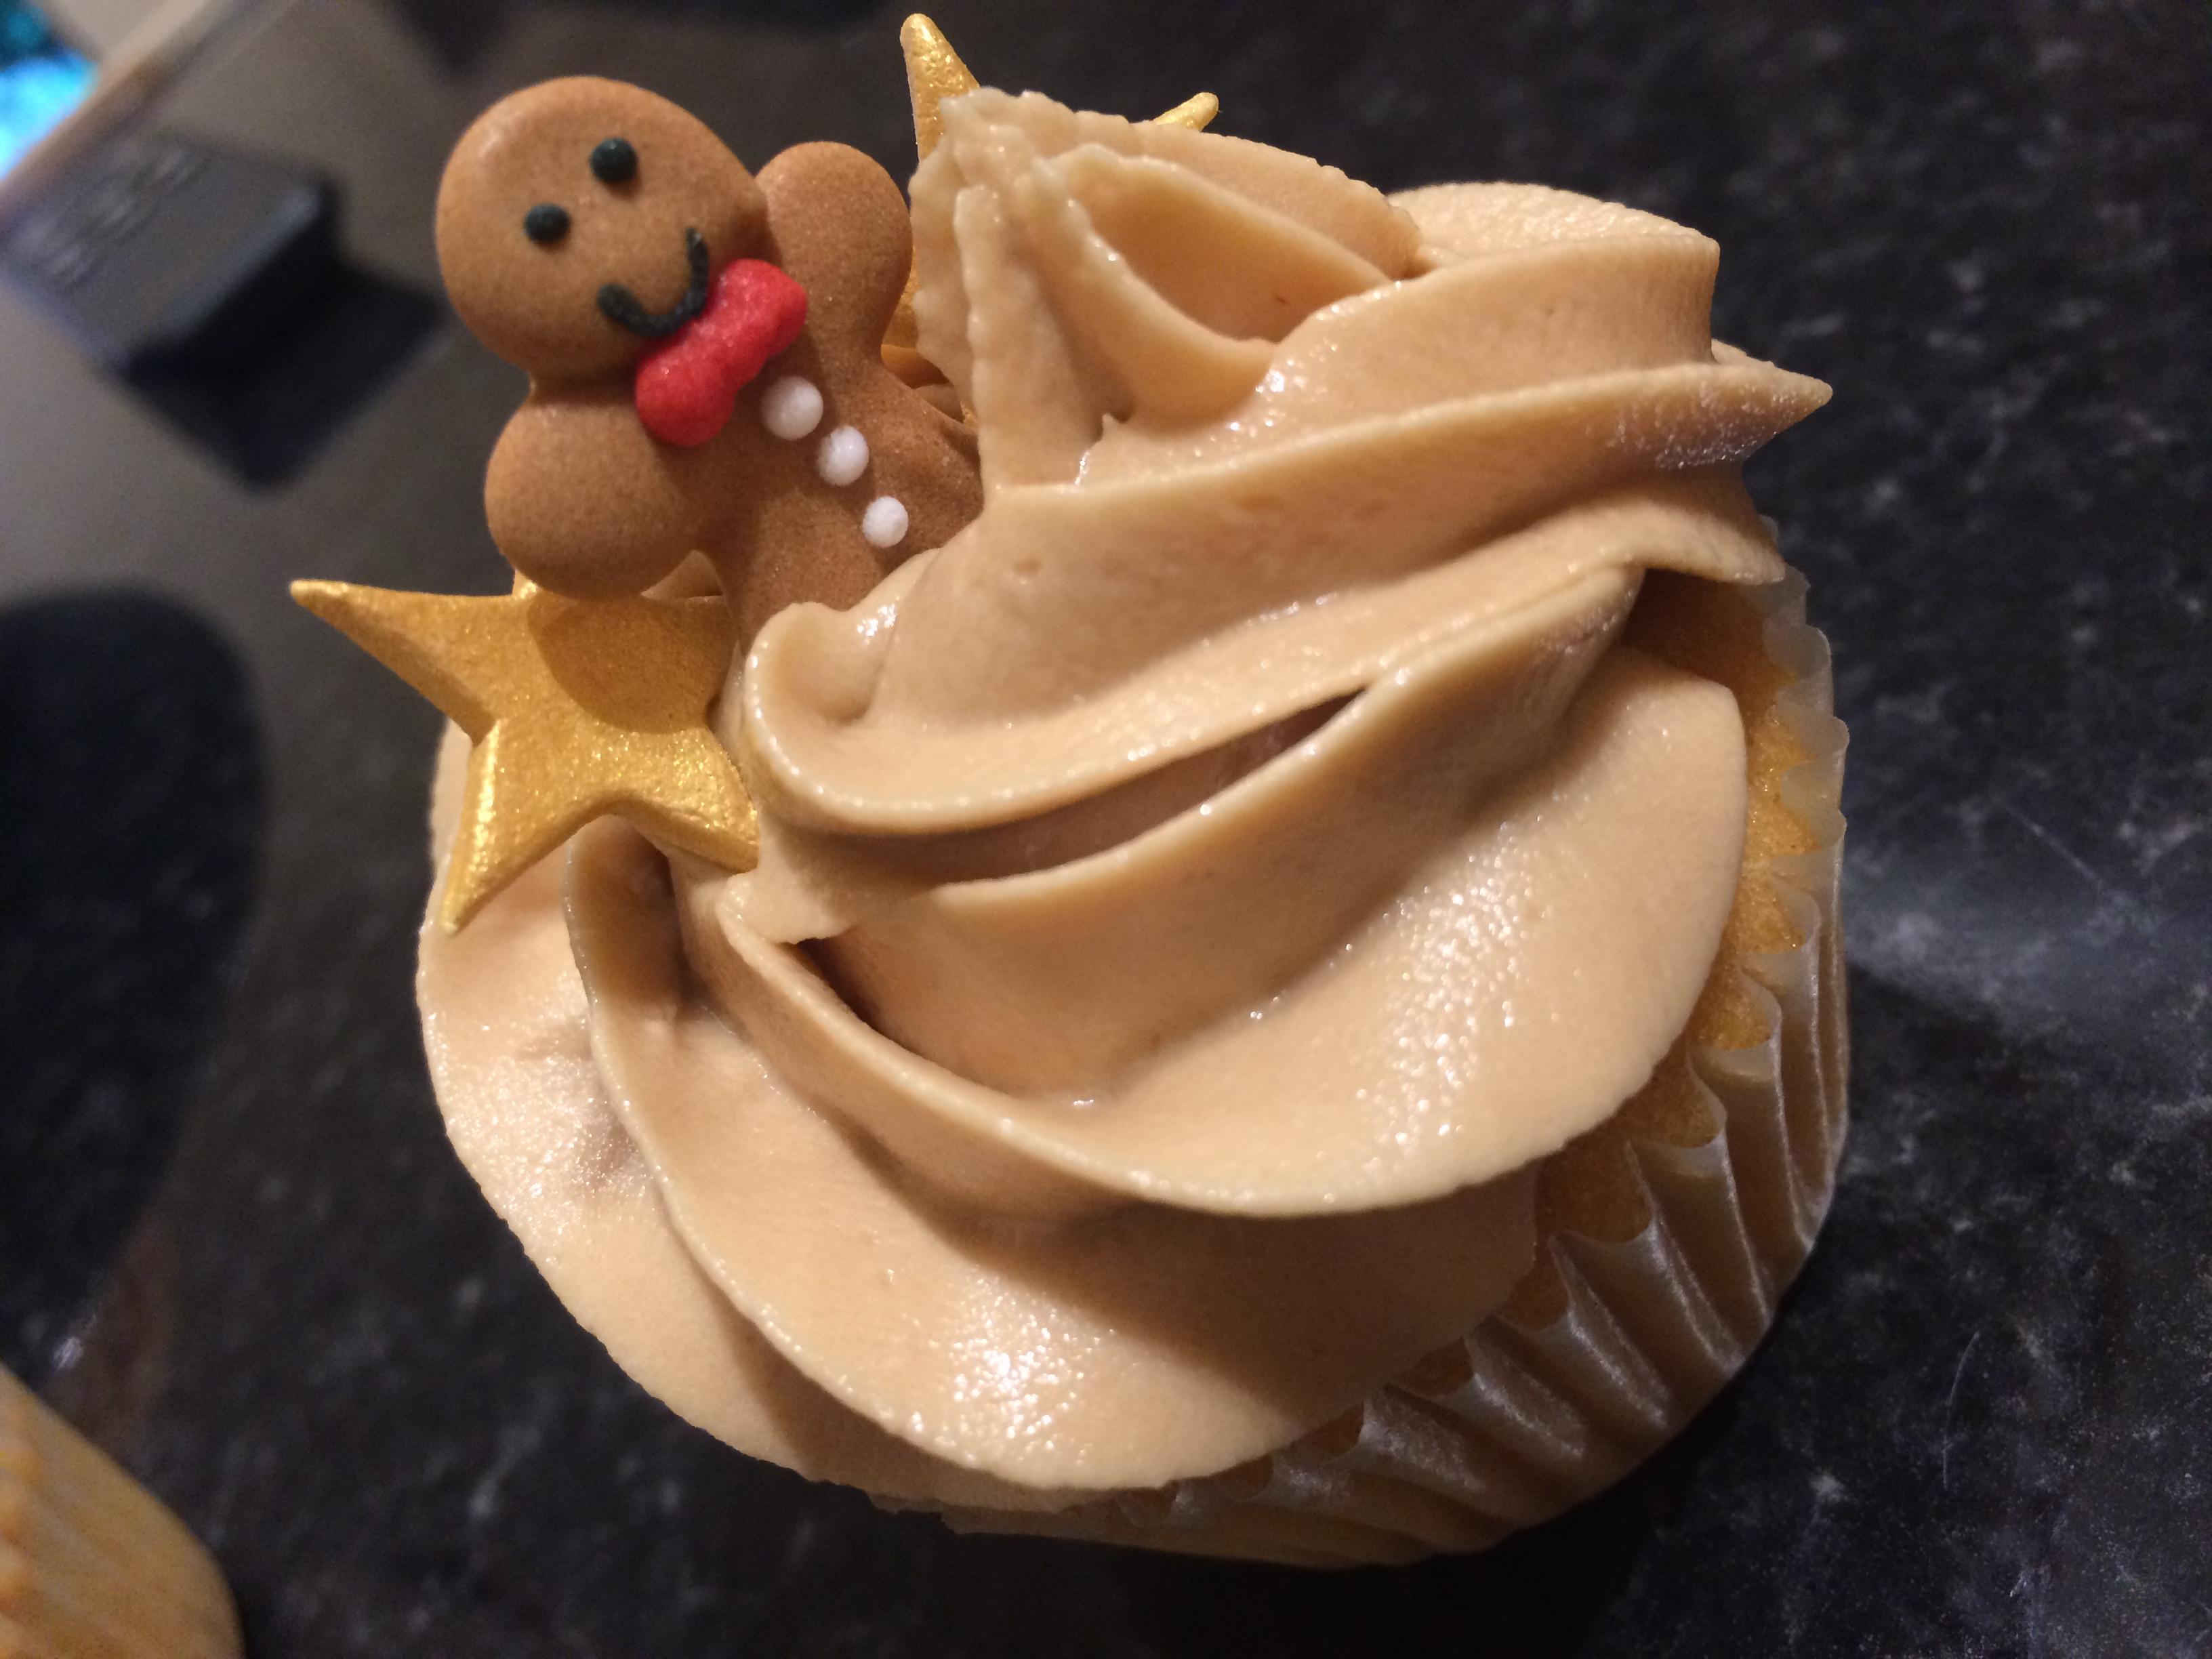 Caramel & gingerbread man cupcake